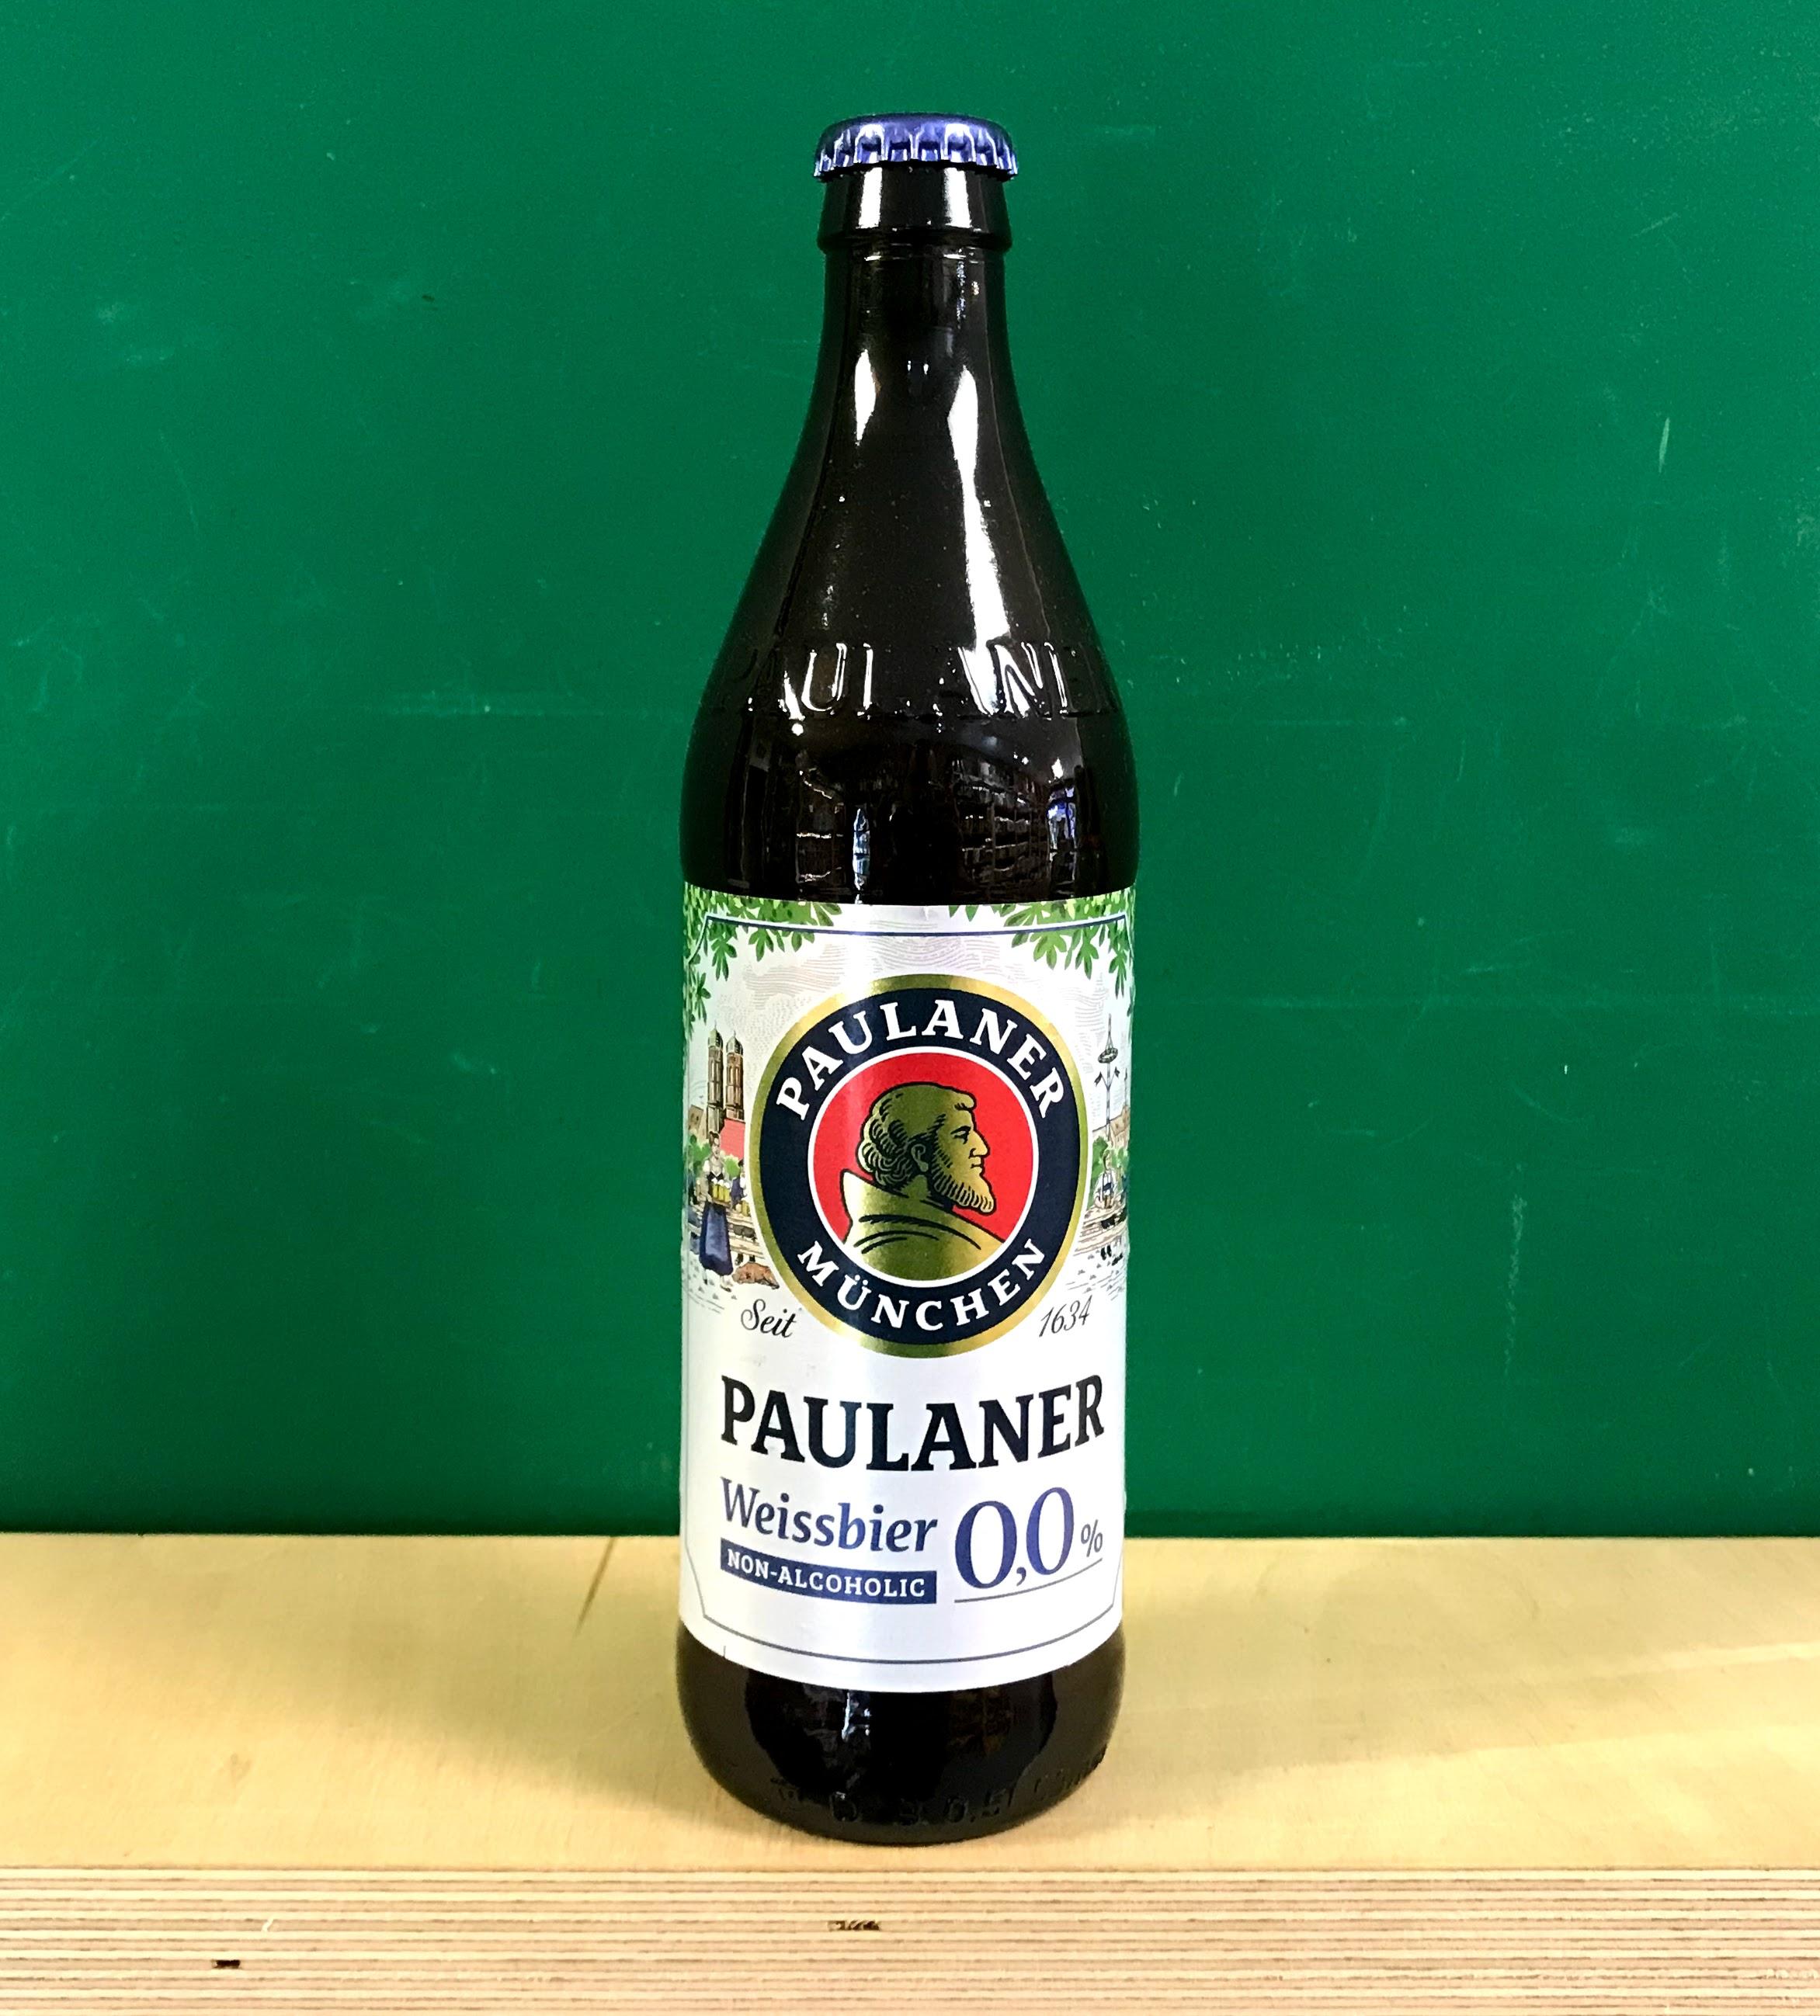 Paulaner Weissbier Alcohol Free